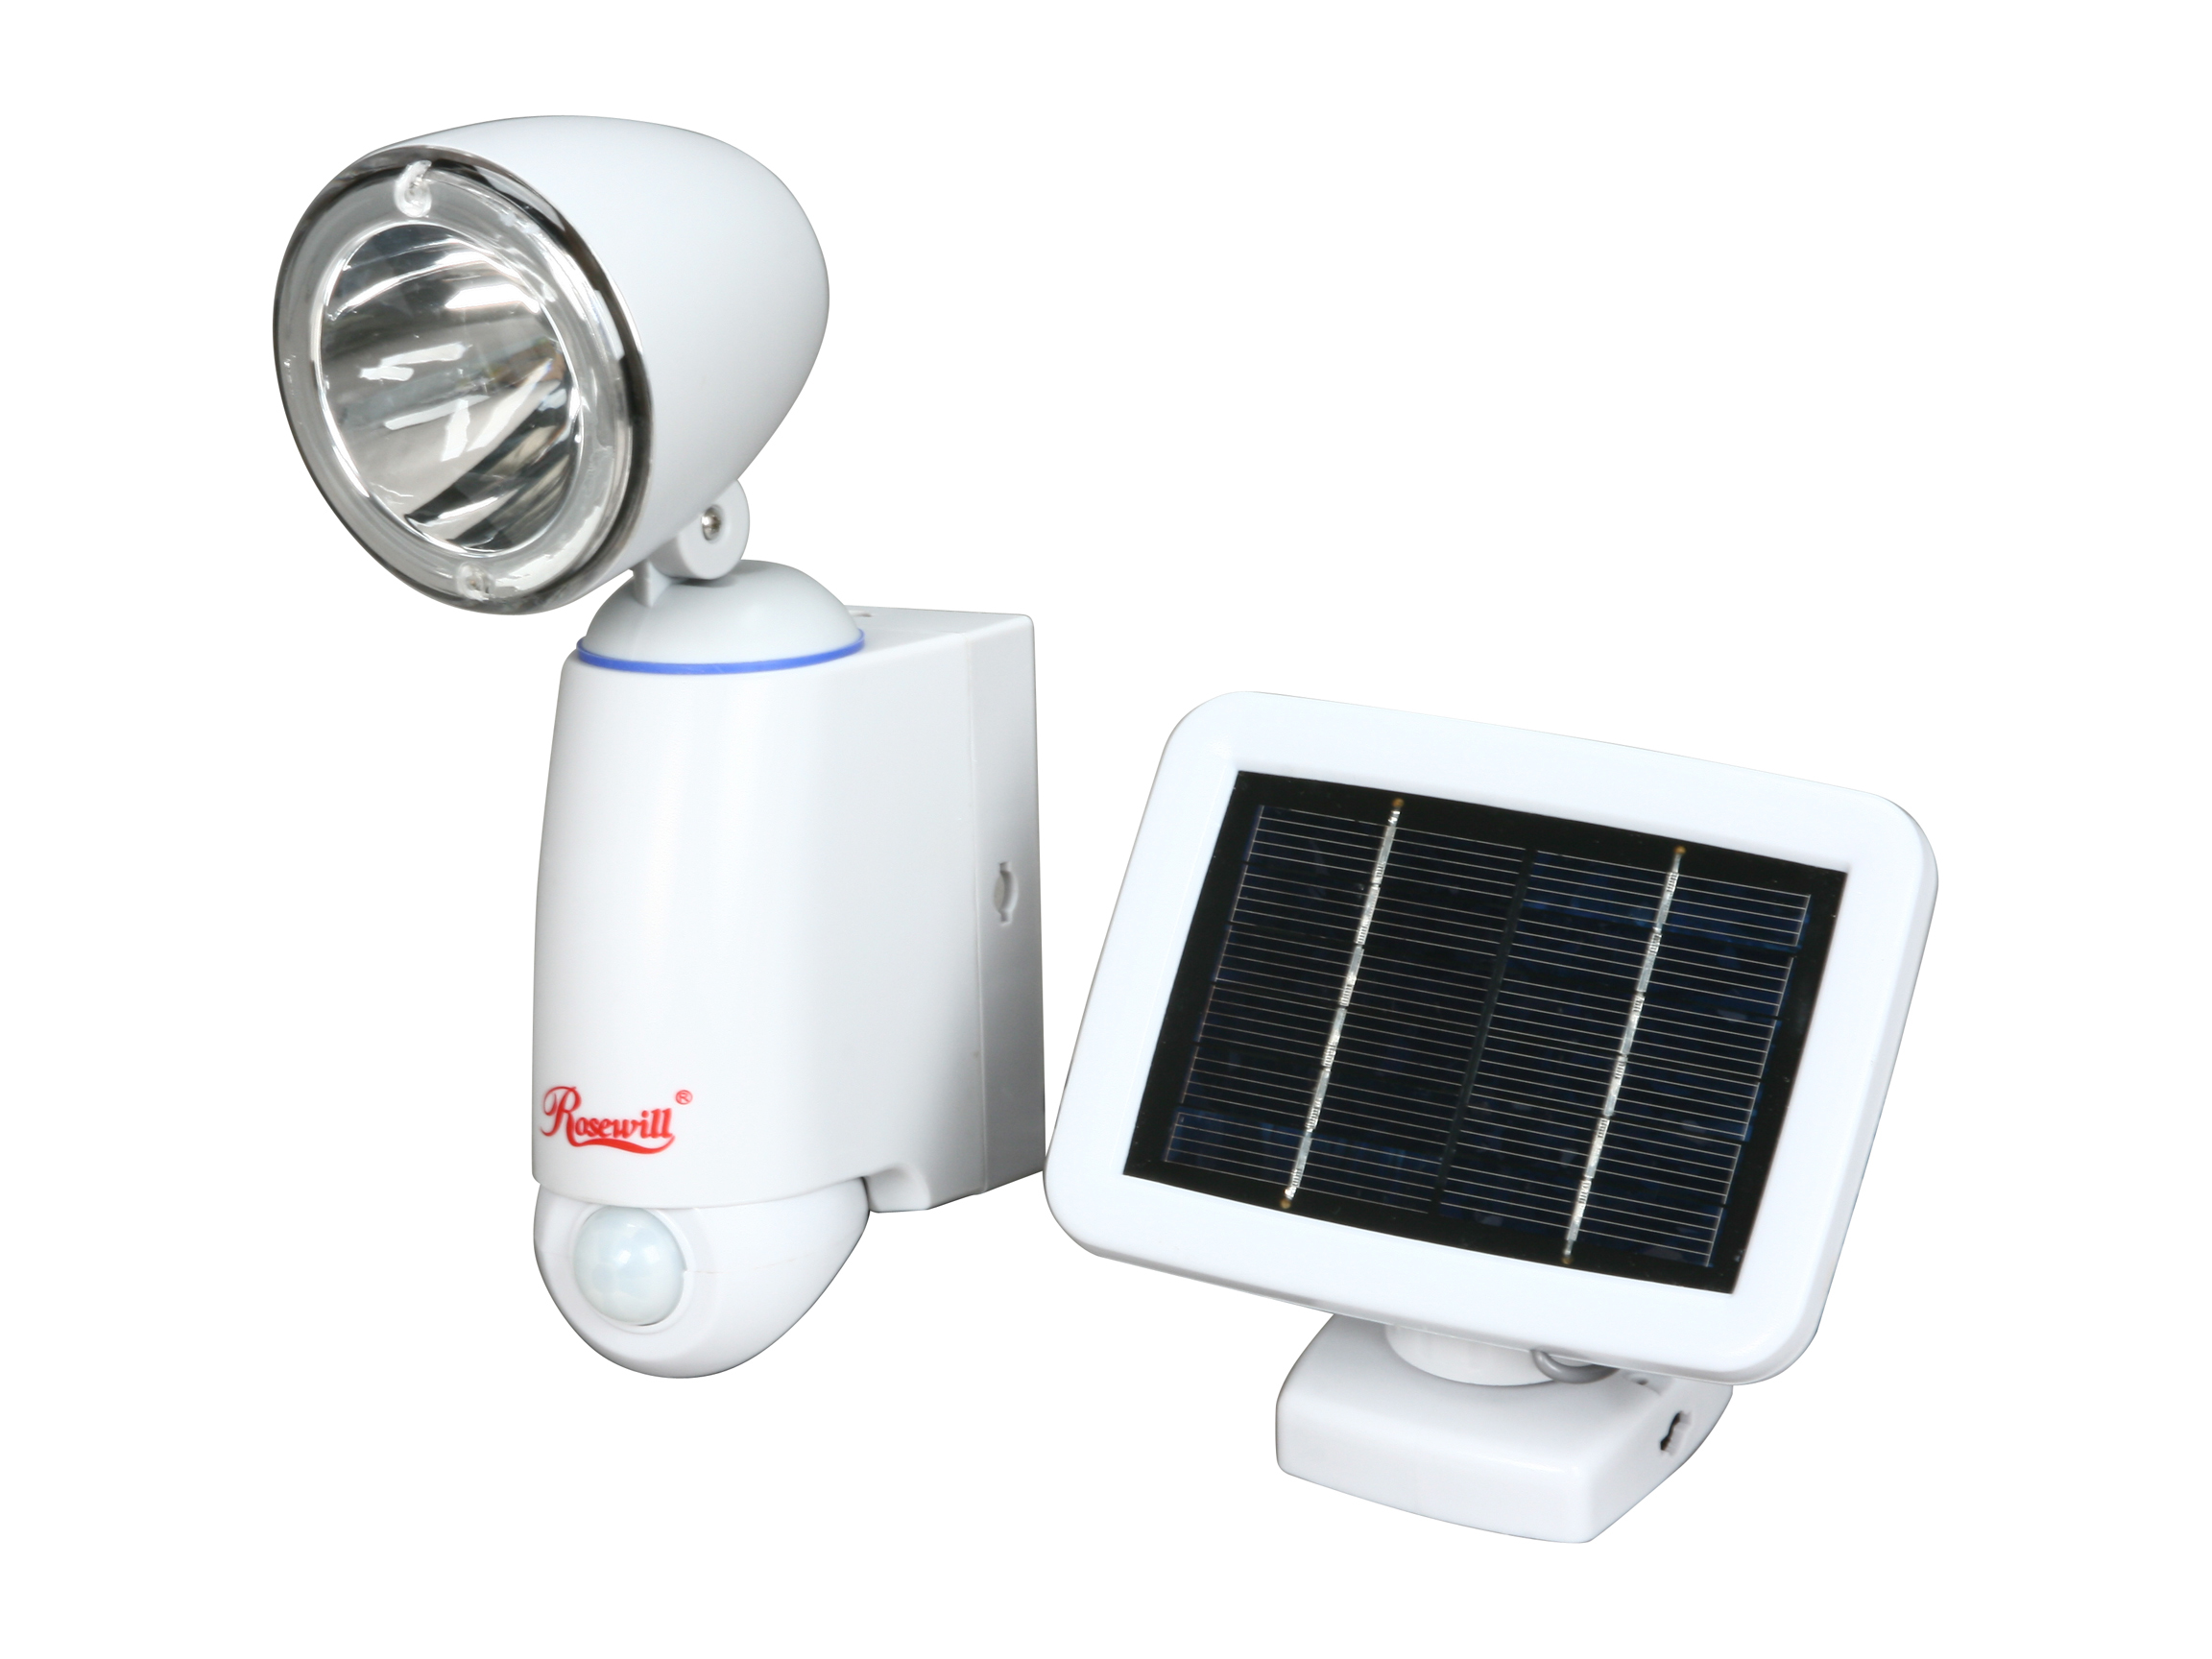 Rosewill Rsl 112 Pir Solar Light Radiolabs Wireless 1watt Amplifier And Poe Injector